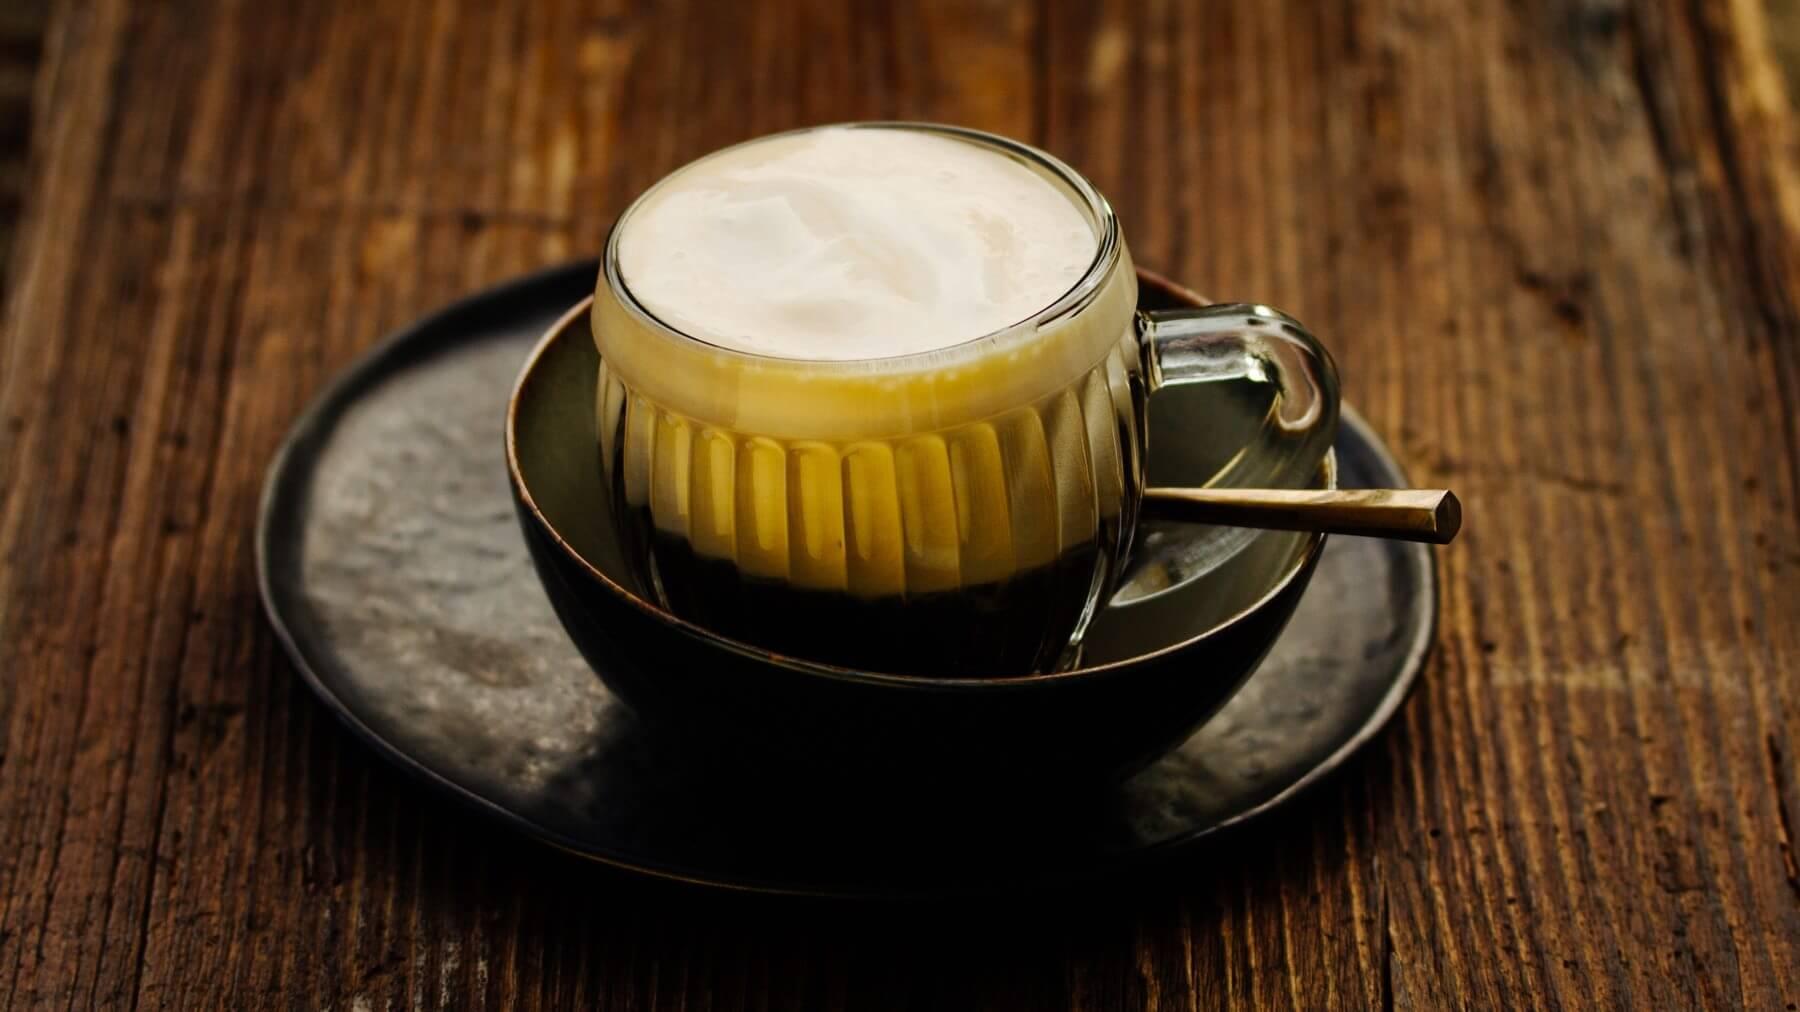 Kaffee mit Zabaione